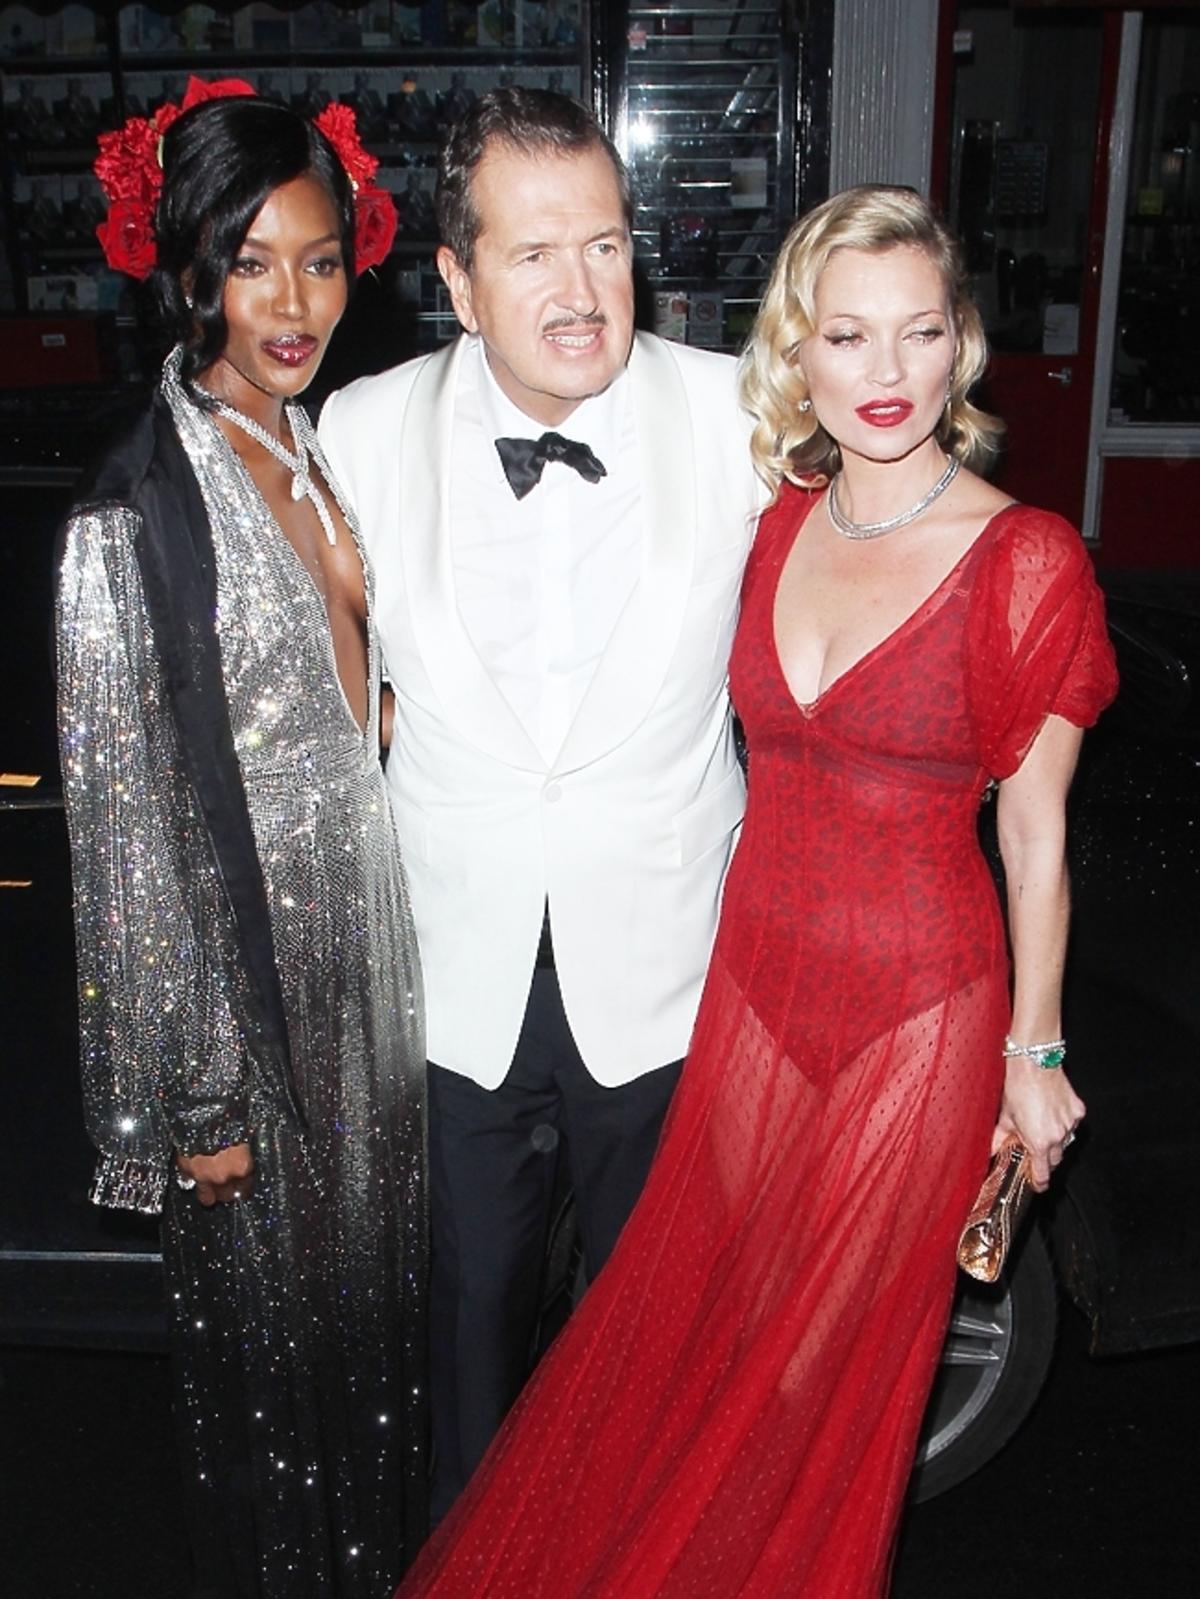 Kate Moss i Naomi Campbell na urodzinach Mario Testino w Londynie